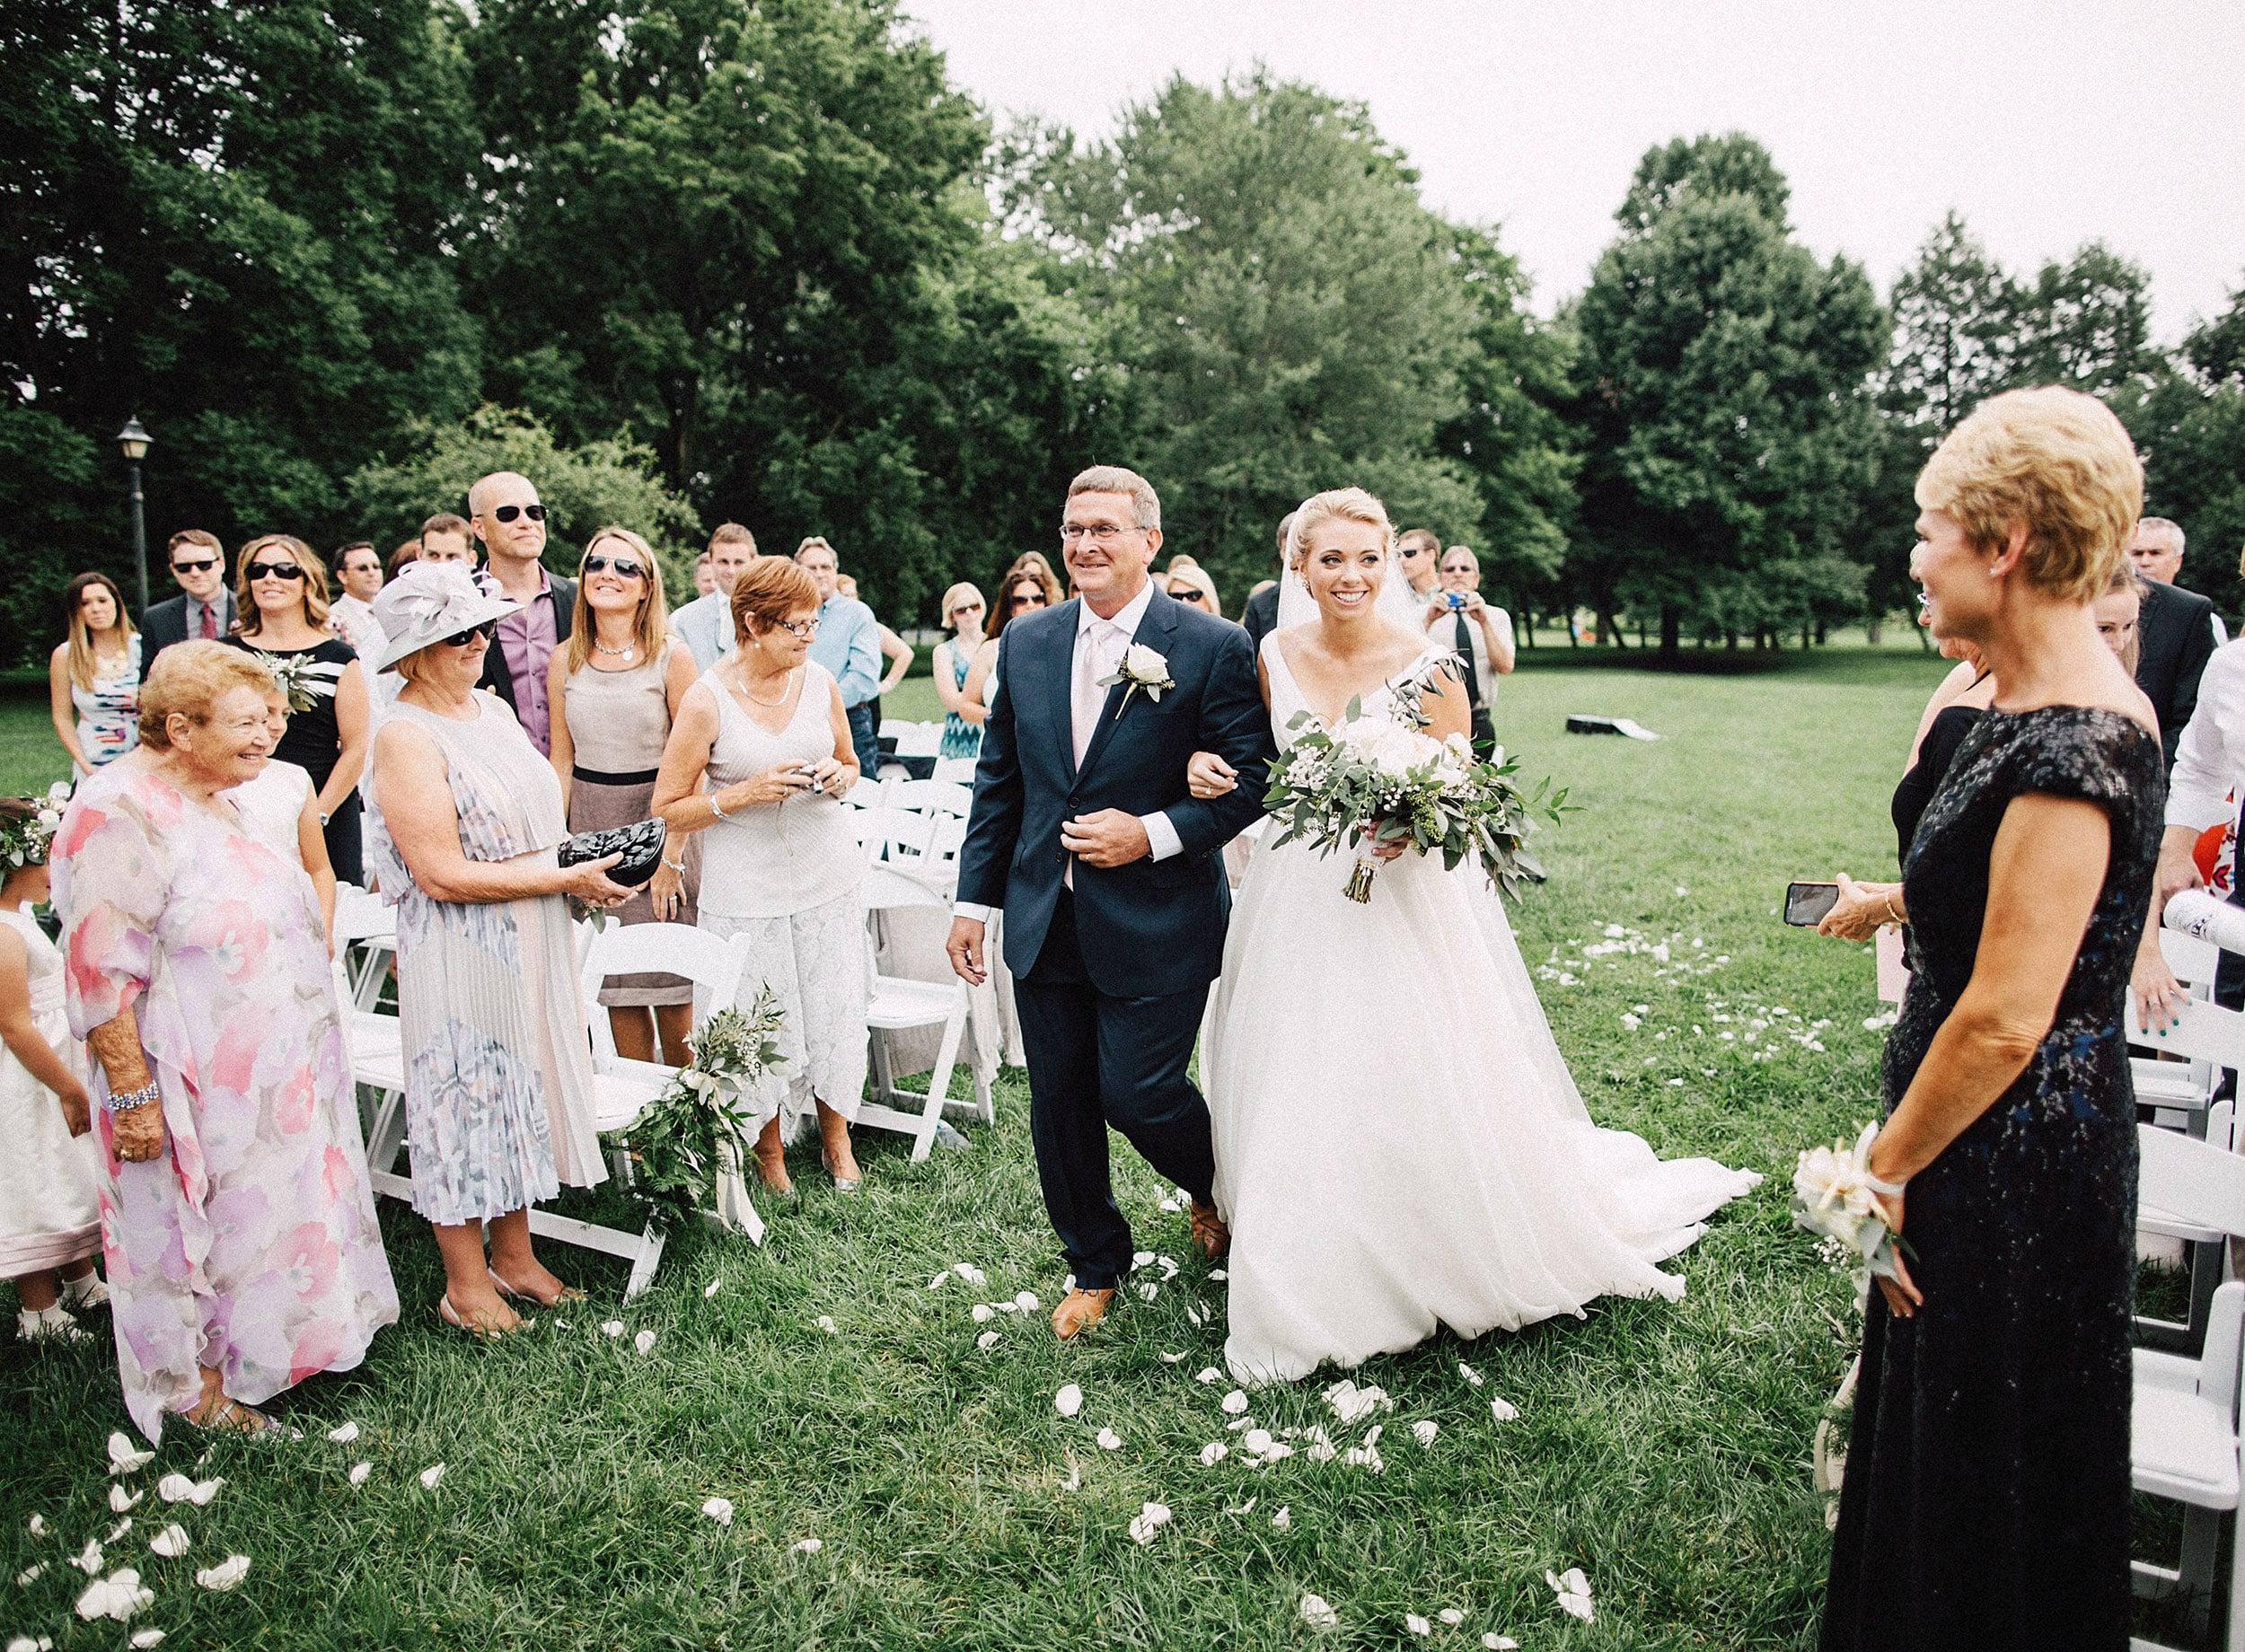 spindletop-lexington-wedding-photographer-023.JPG